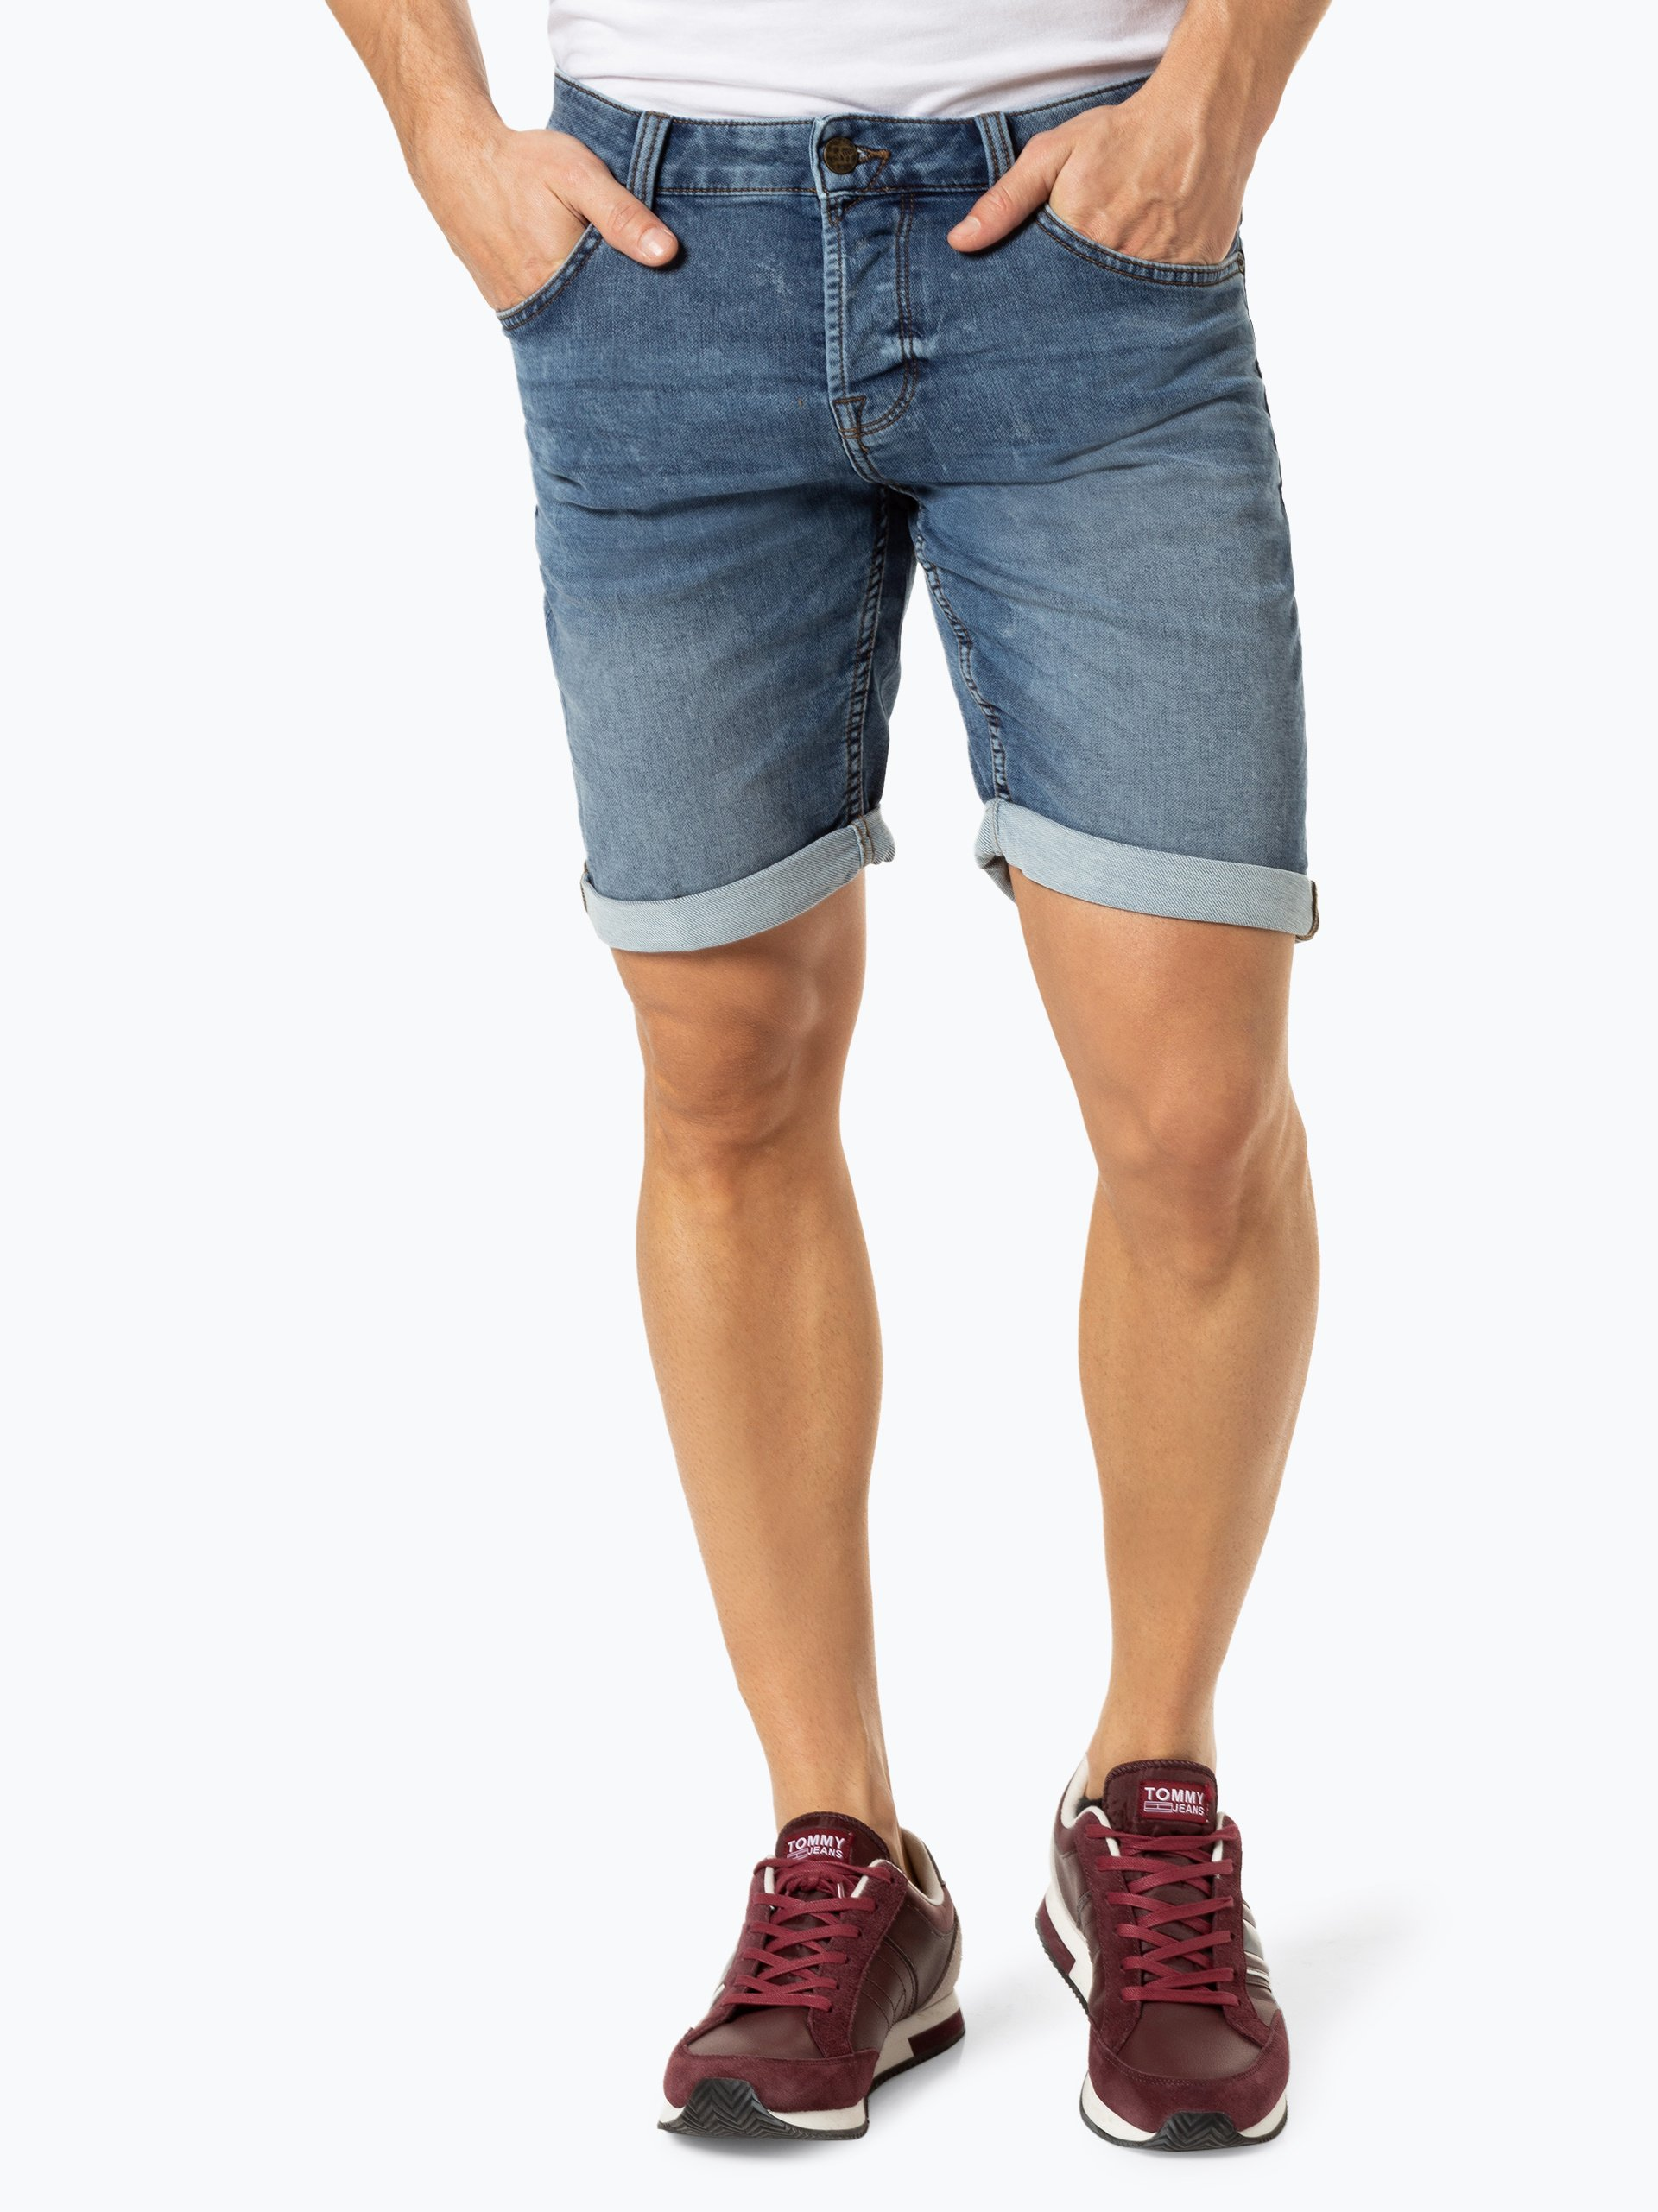 Only&Sons Herren Jeansshorts